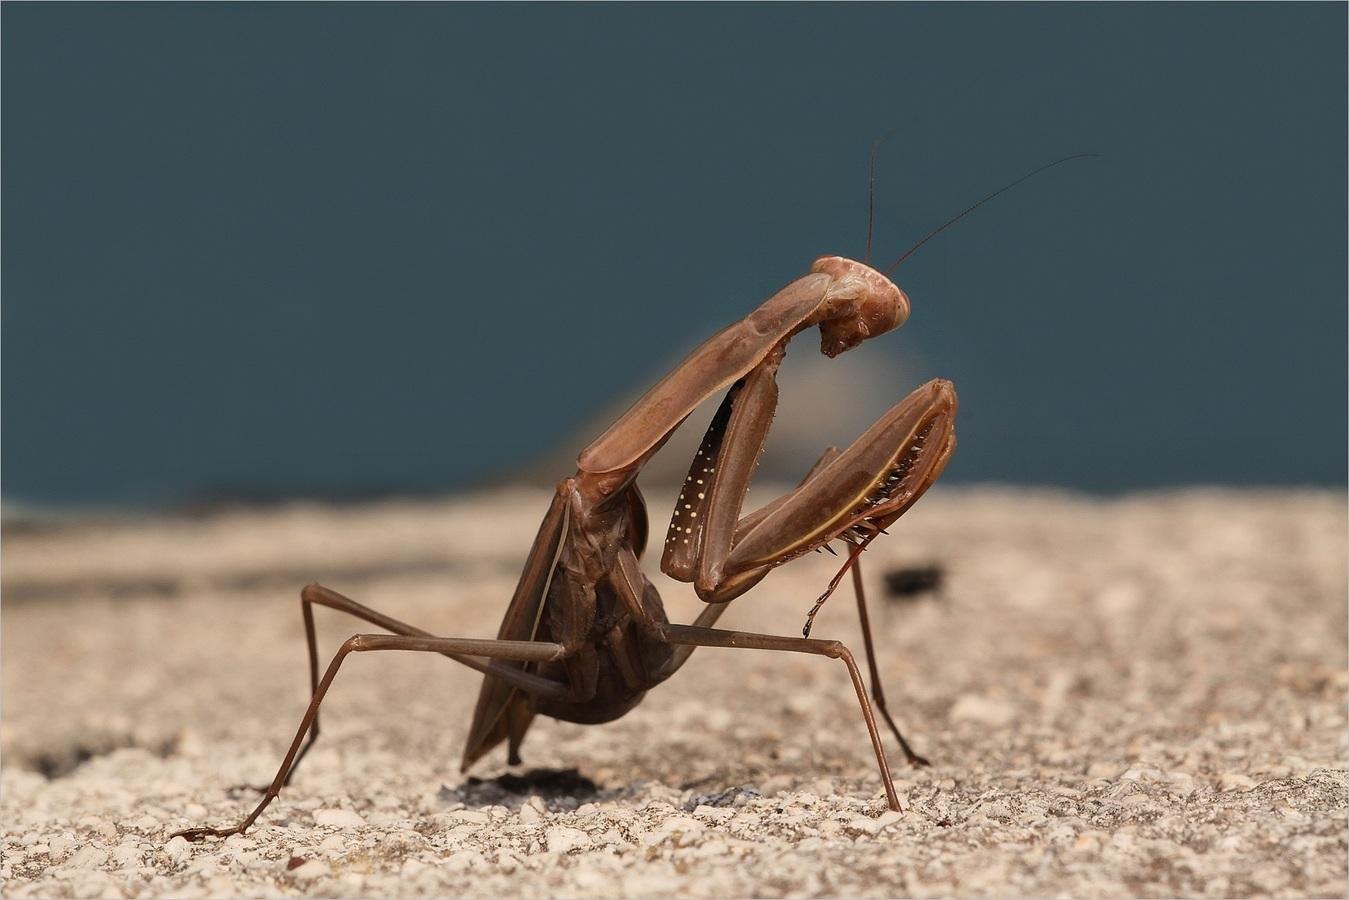 Bude mi ta moucha stačit k obědu?